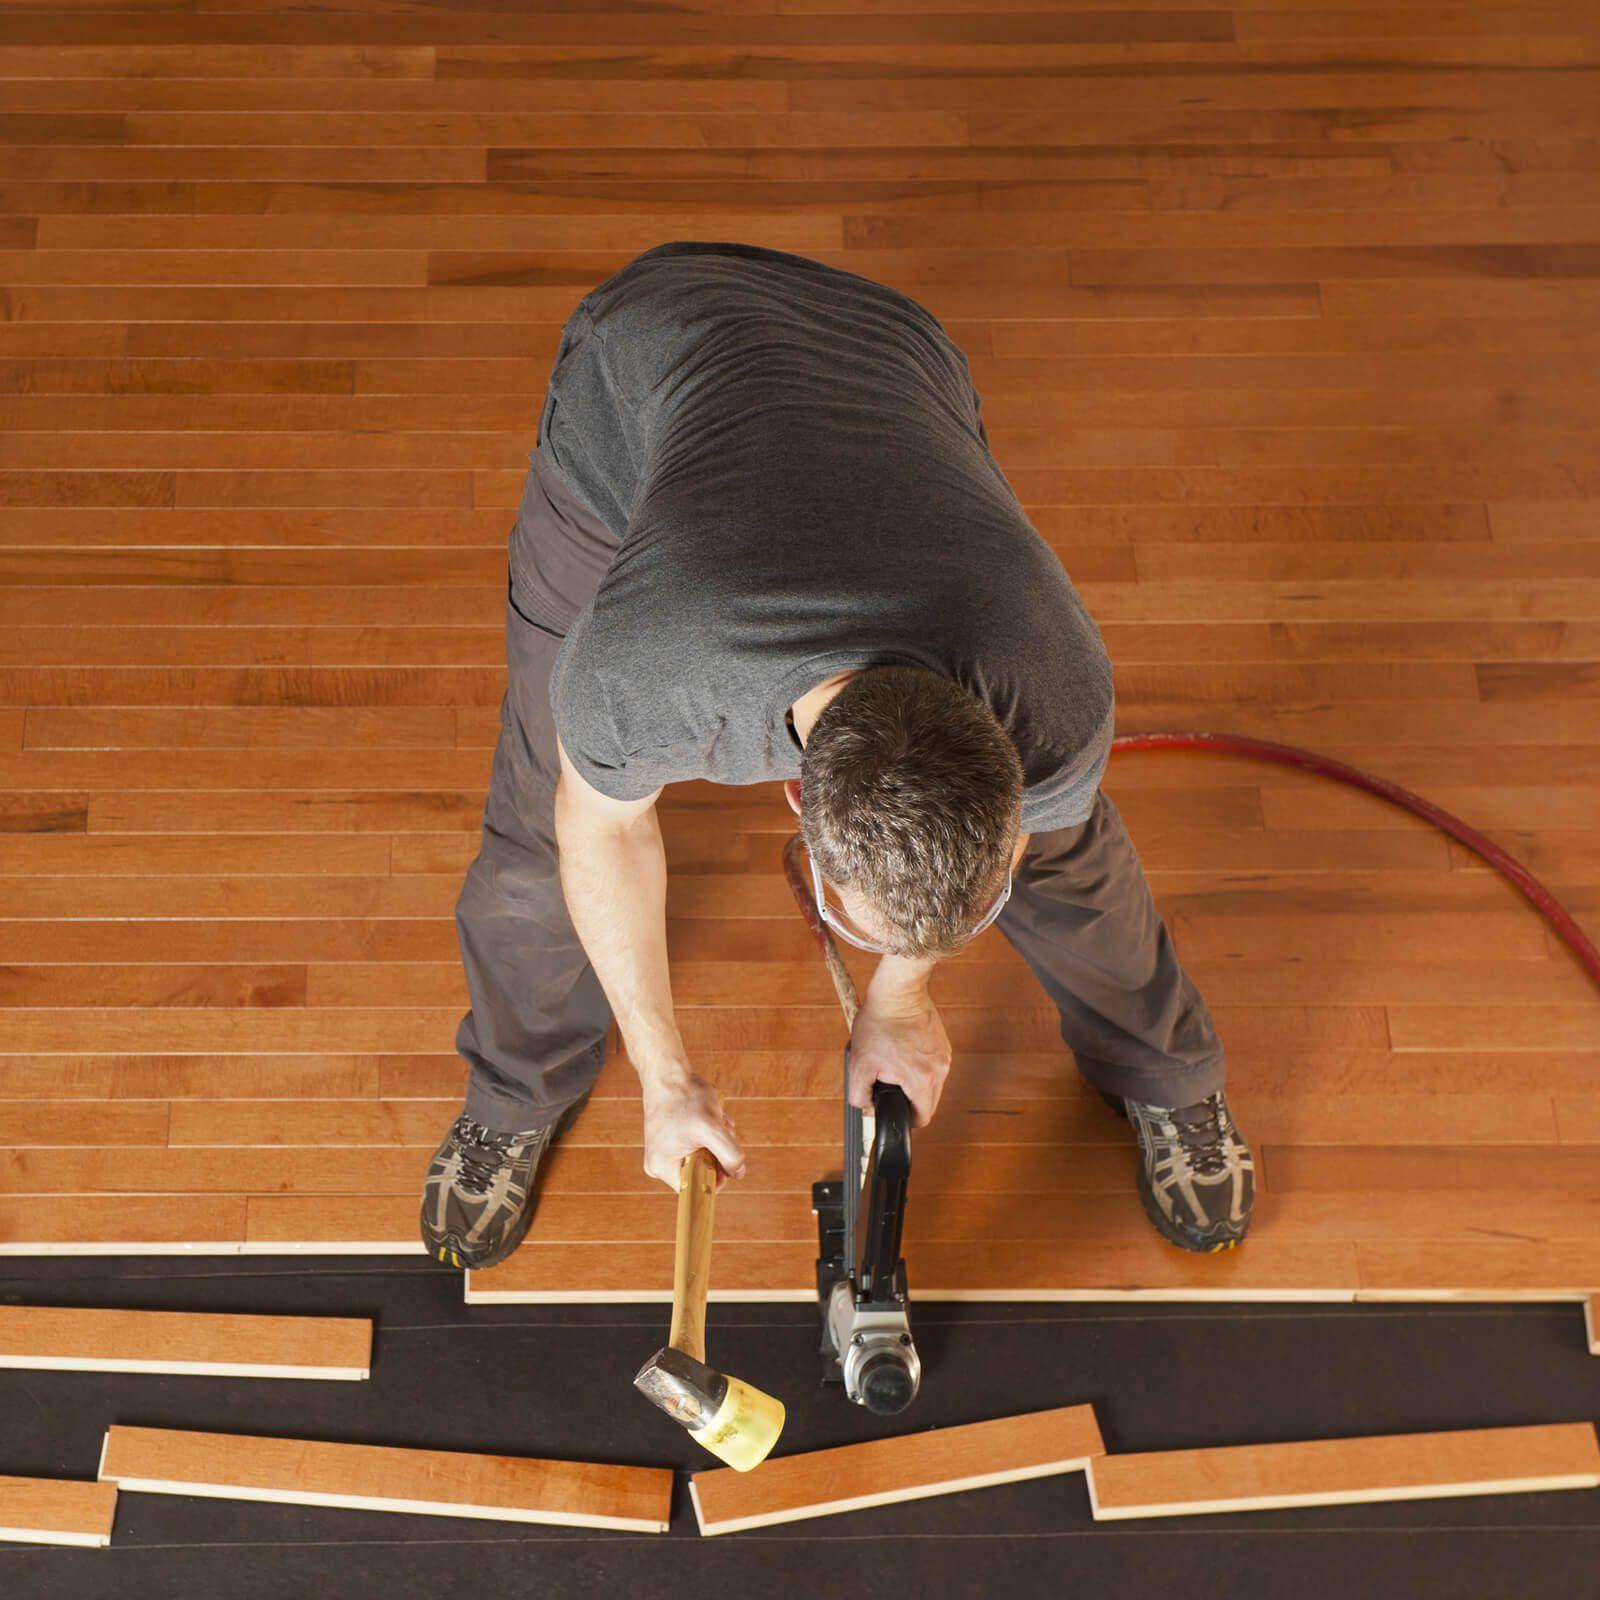 Adobe stock | Broadway Carpets, Inc